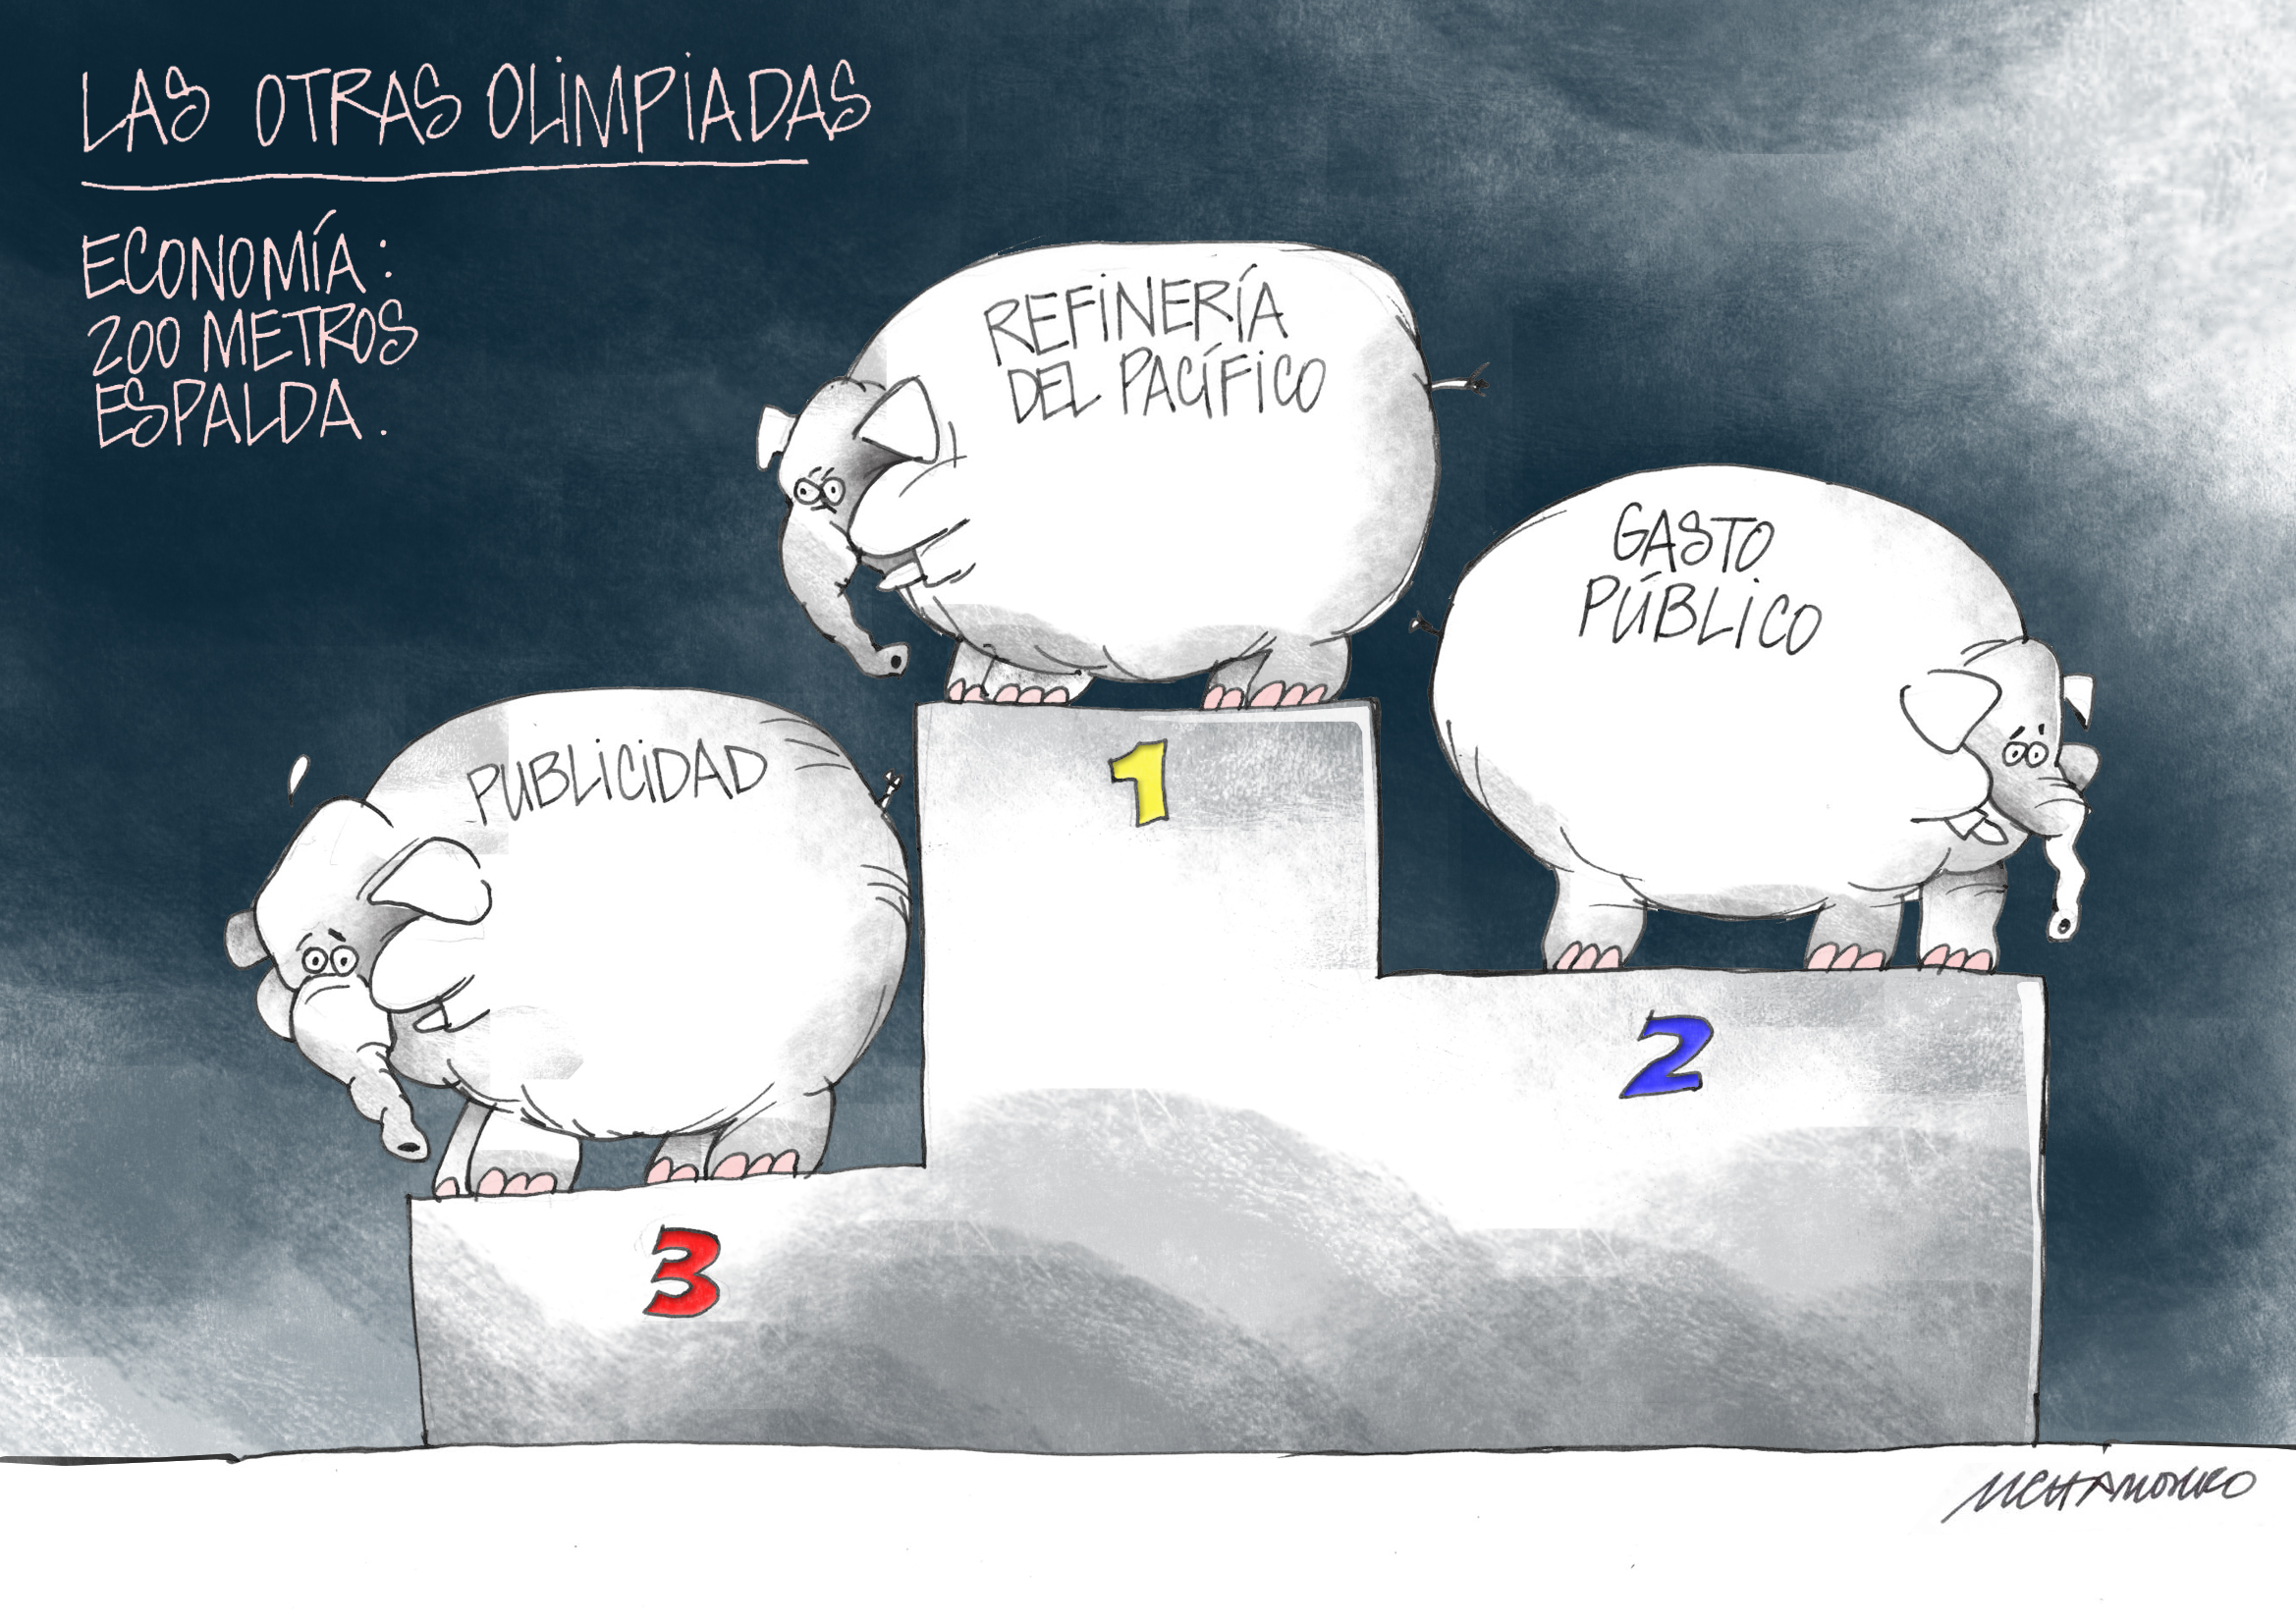 caricatura chamorro olimpiadas.